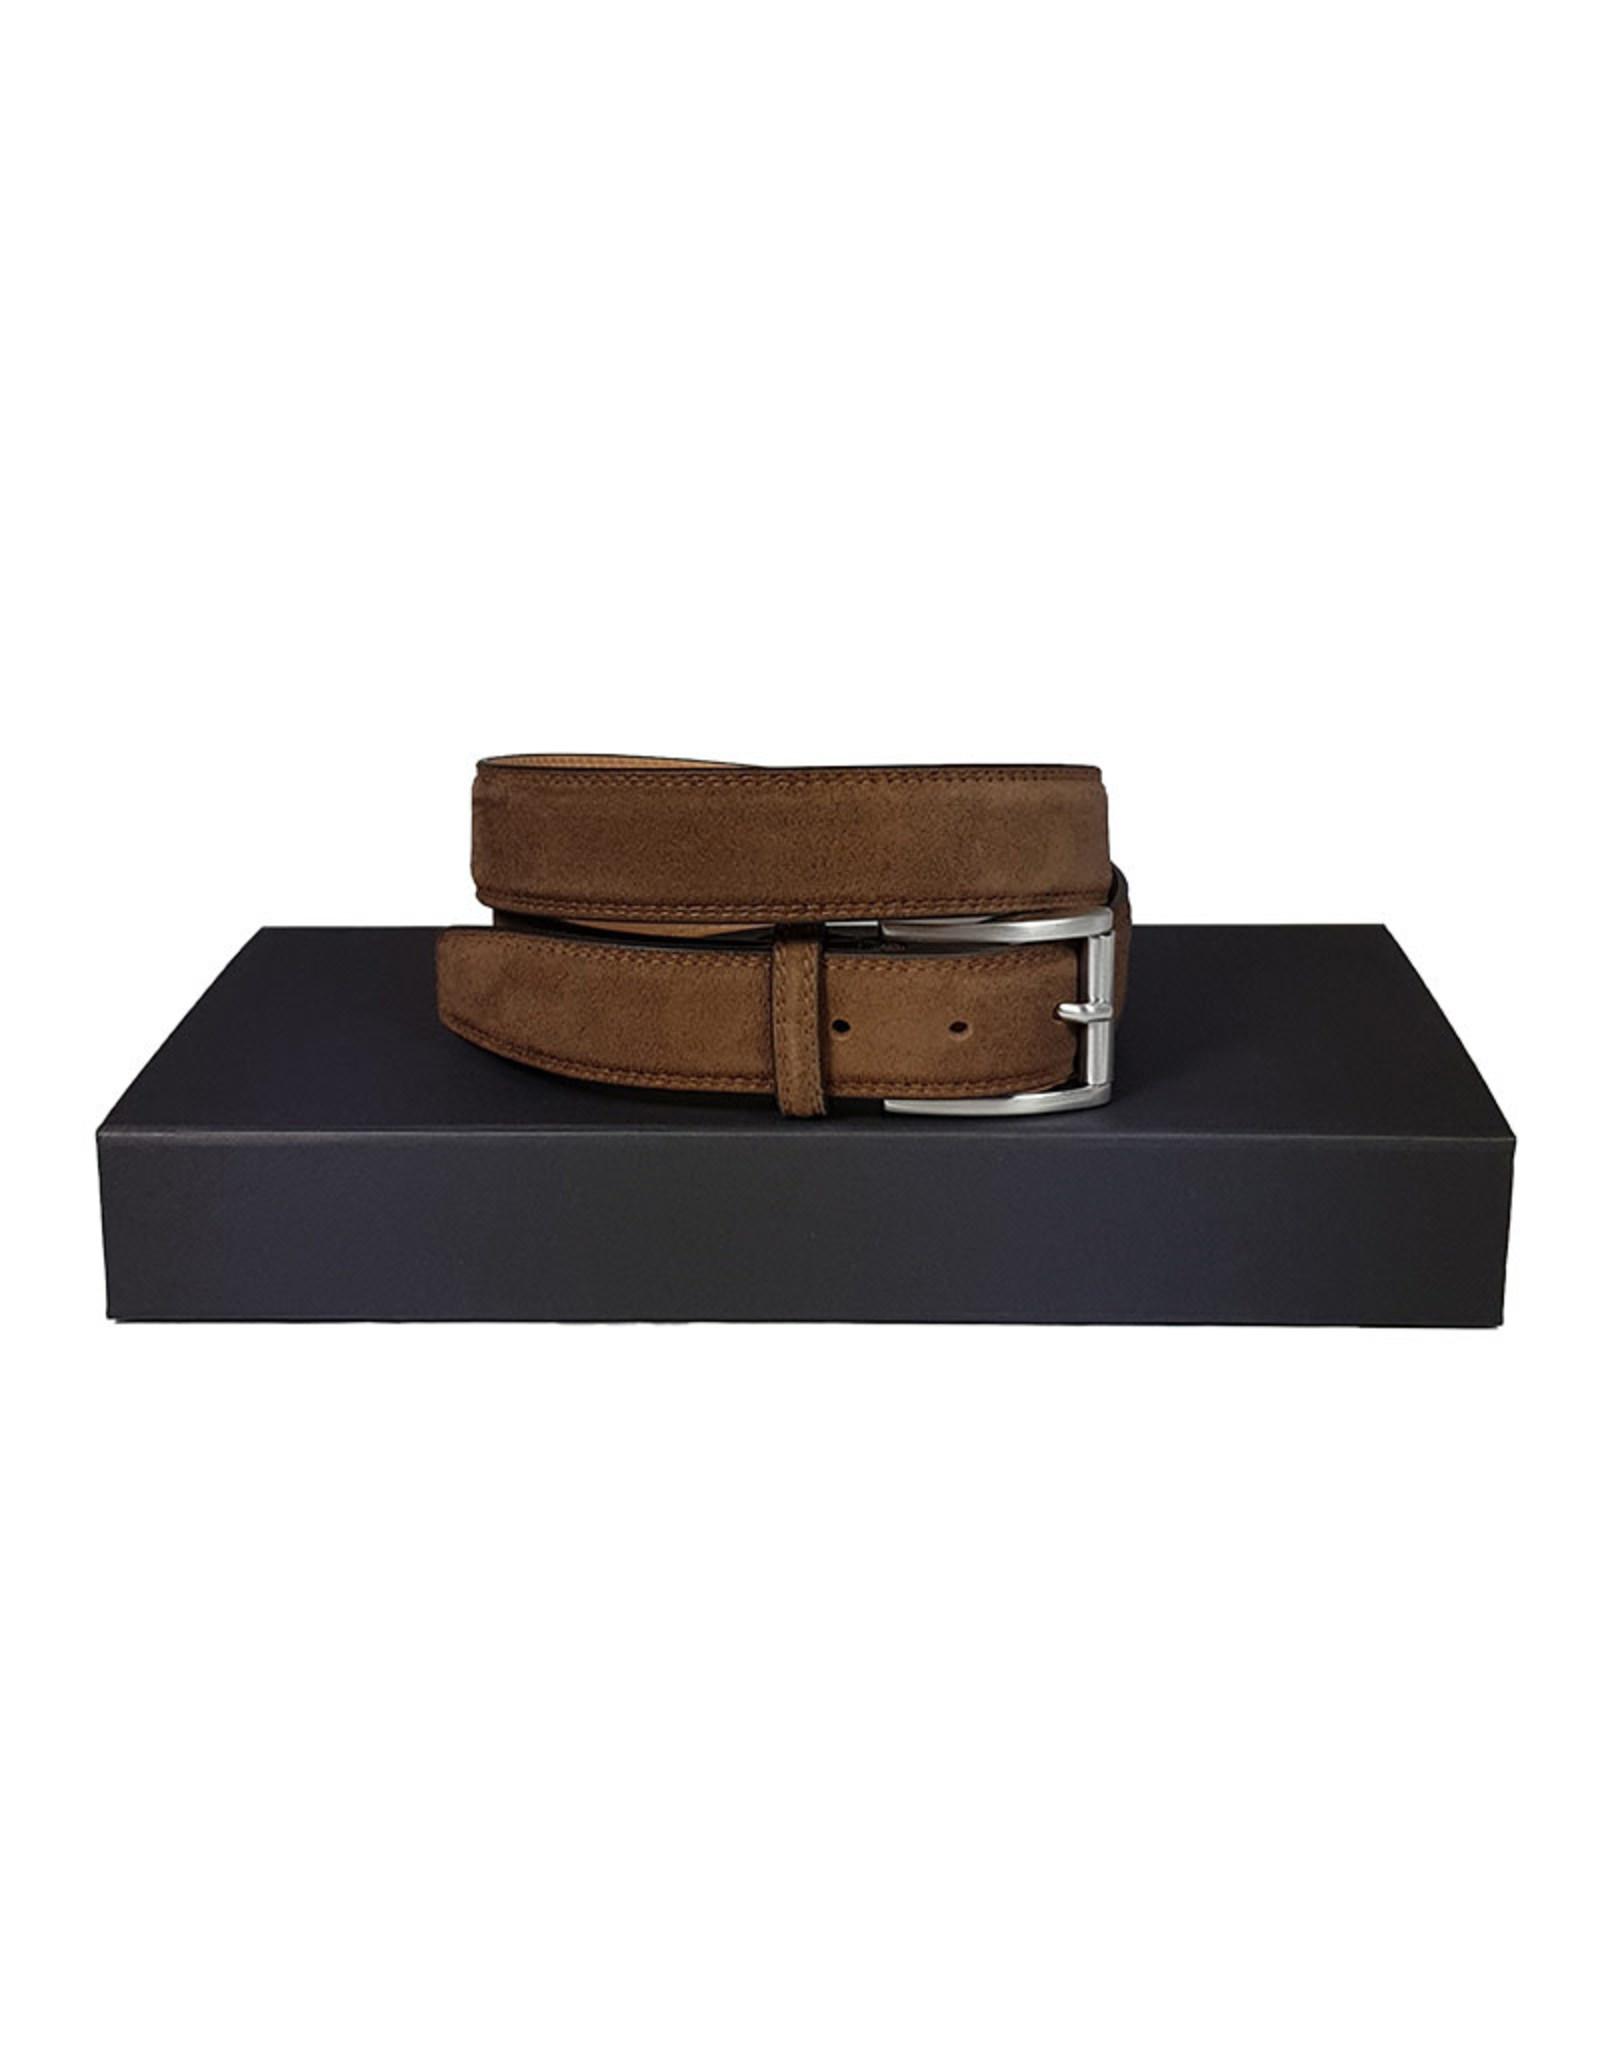 Belts+ Belts+ riem daim bruin Spaccato 20310/870